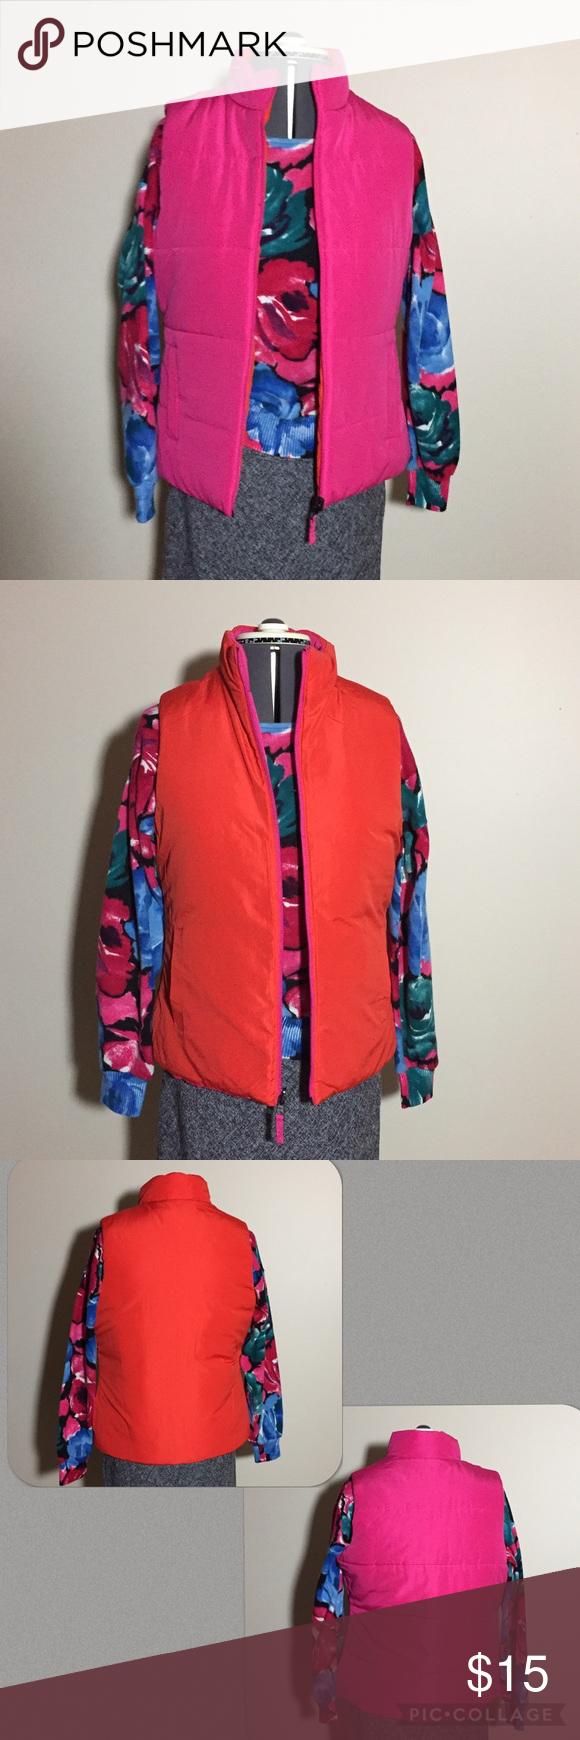 Orange & Pink Reversible Puffer Vest Merona Orange & Pink